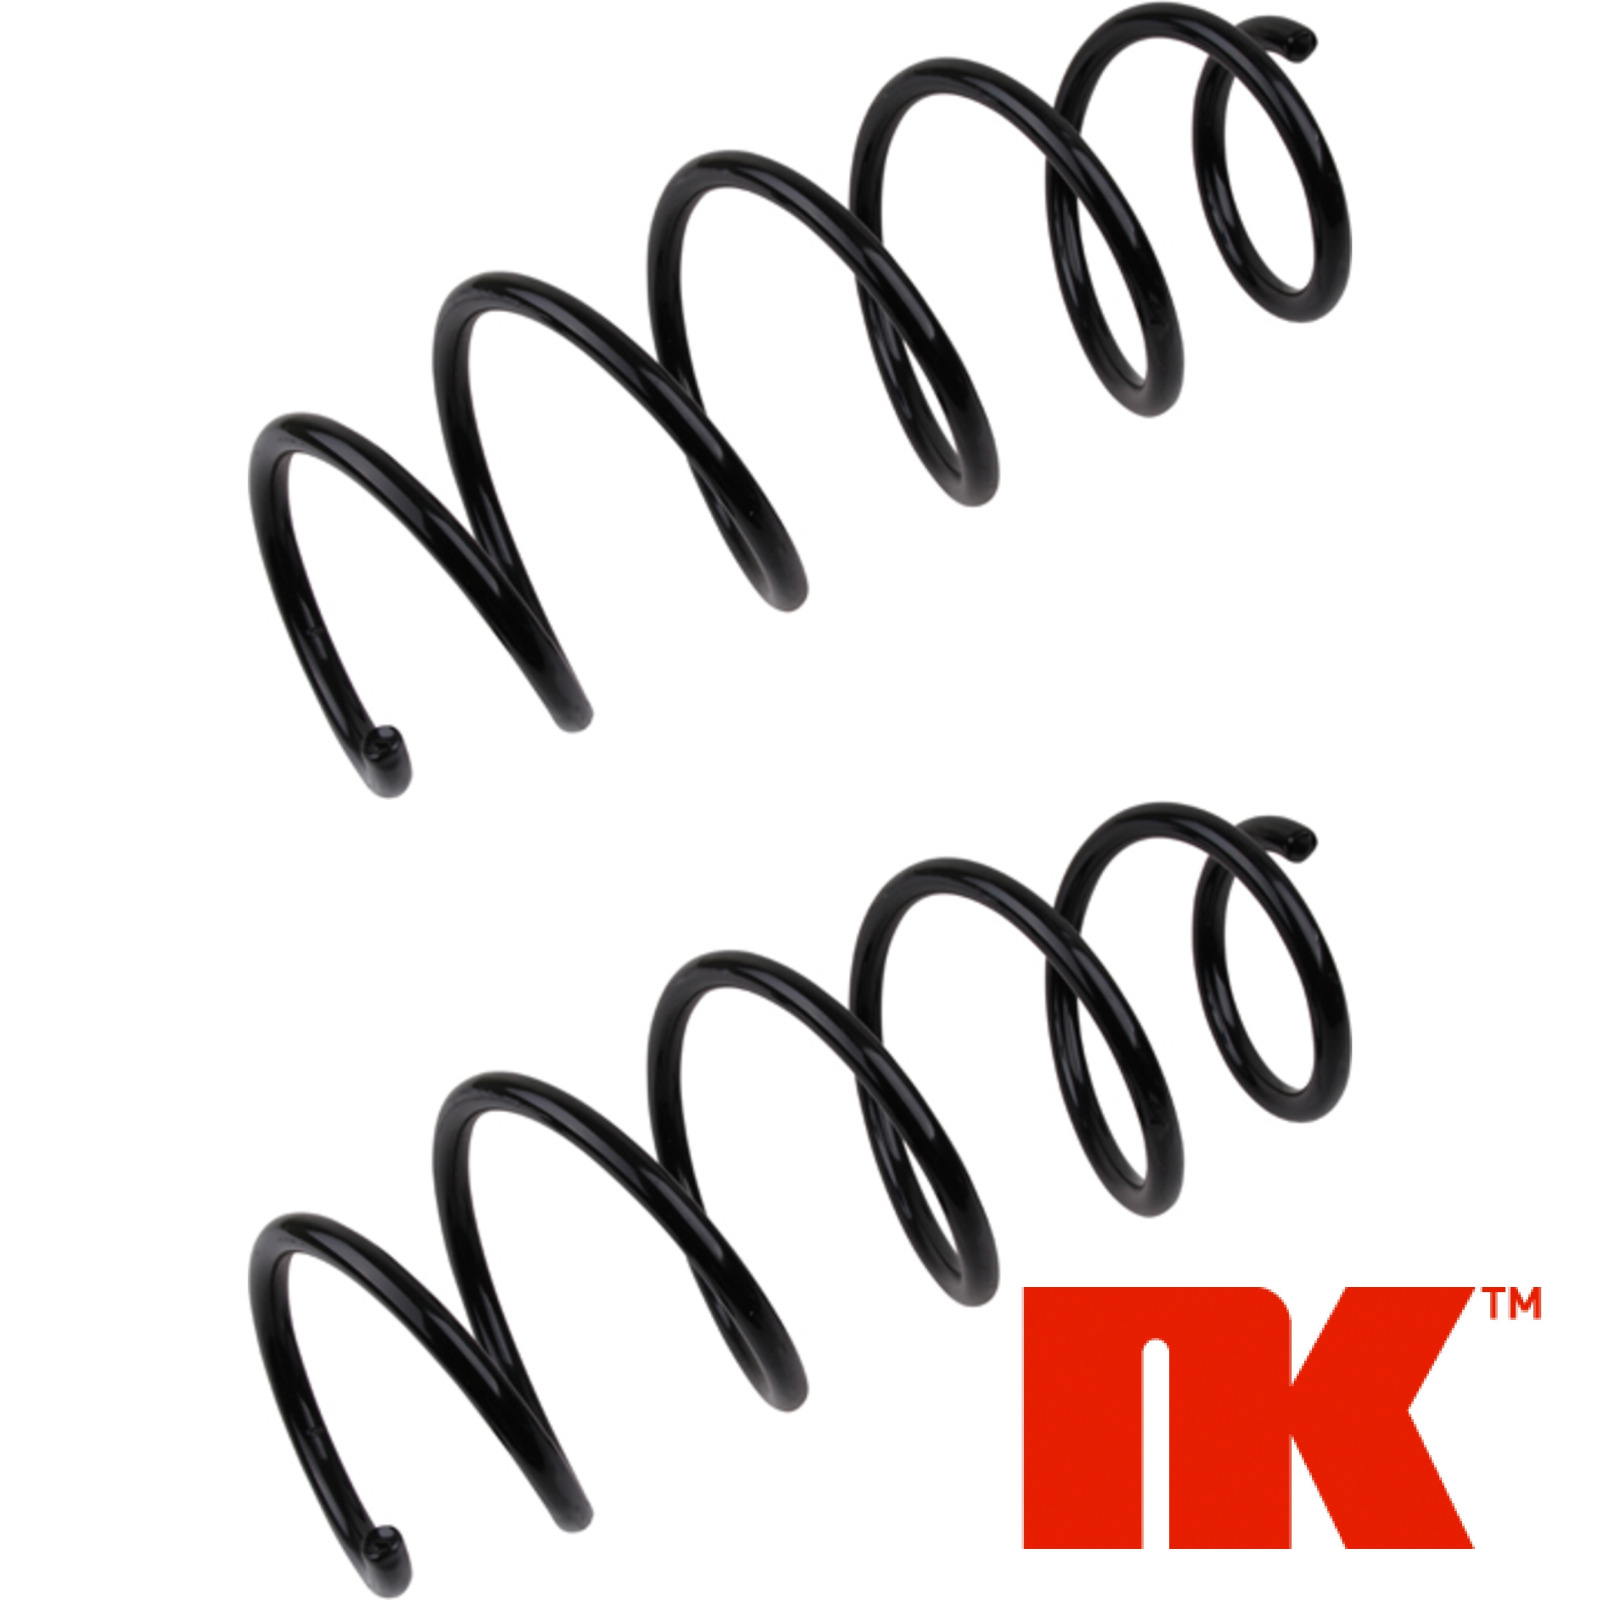 2x NK Fahrwerksfeder 2 Federn Vorn Vorderachse FORD 532569